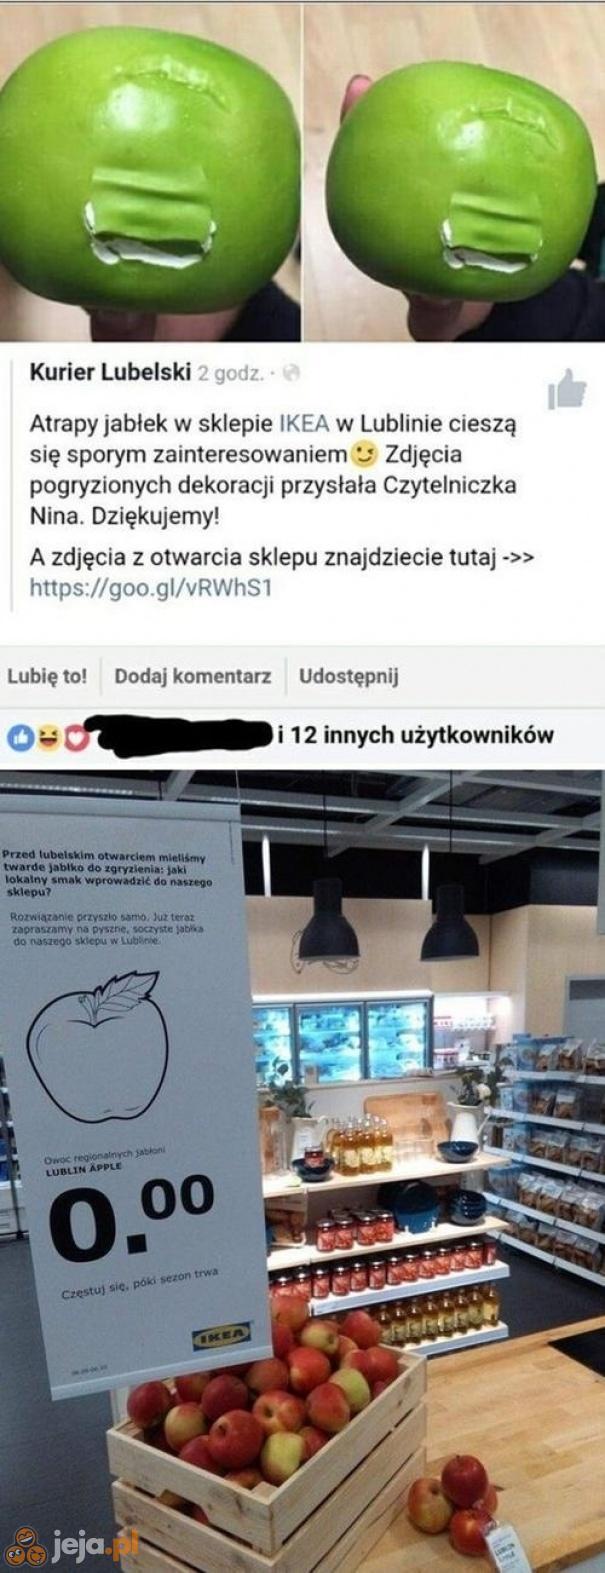 IKEA odpowiada